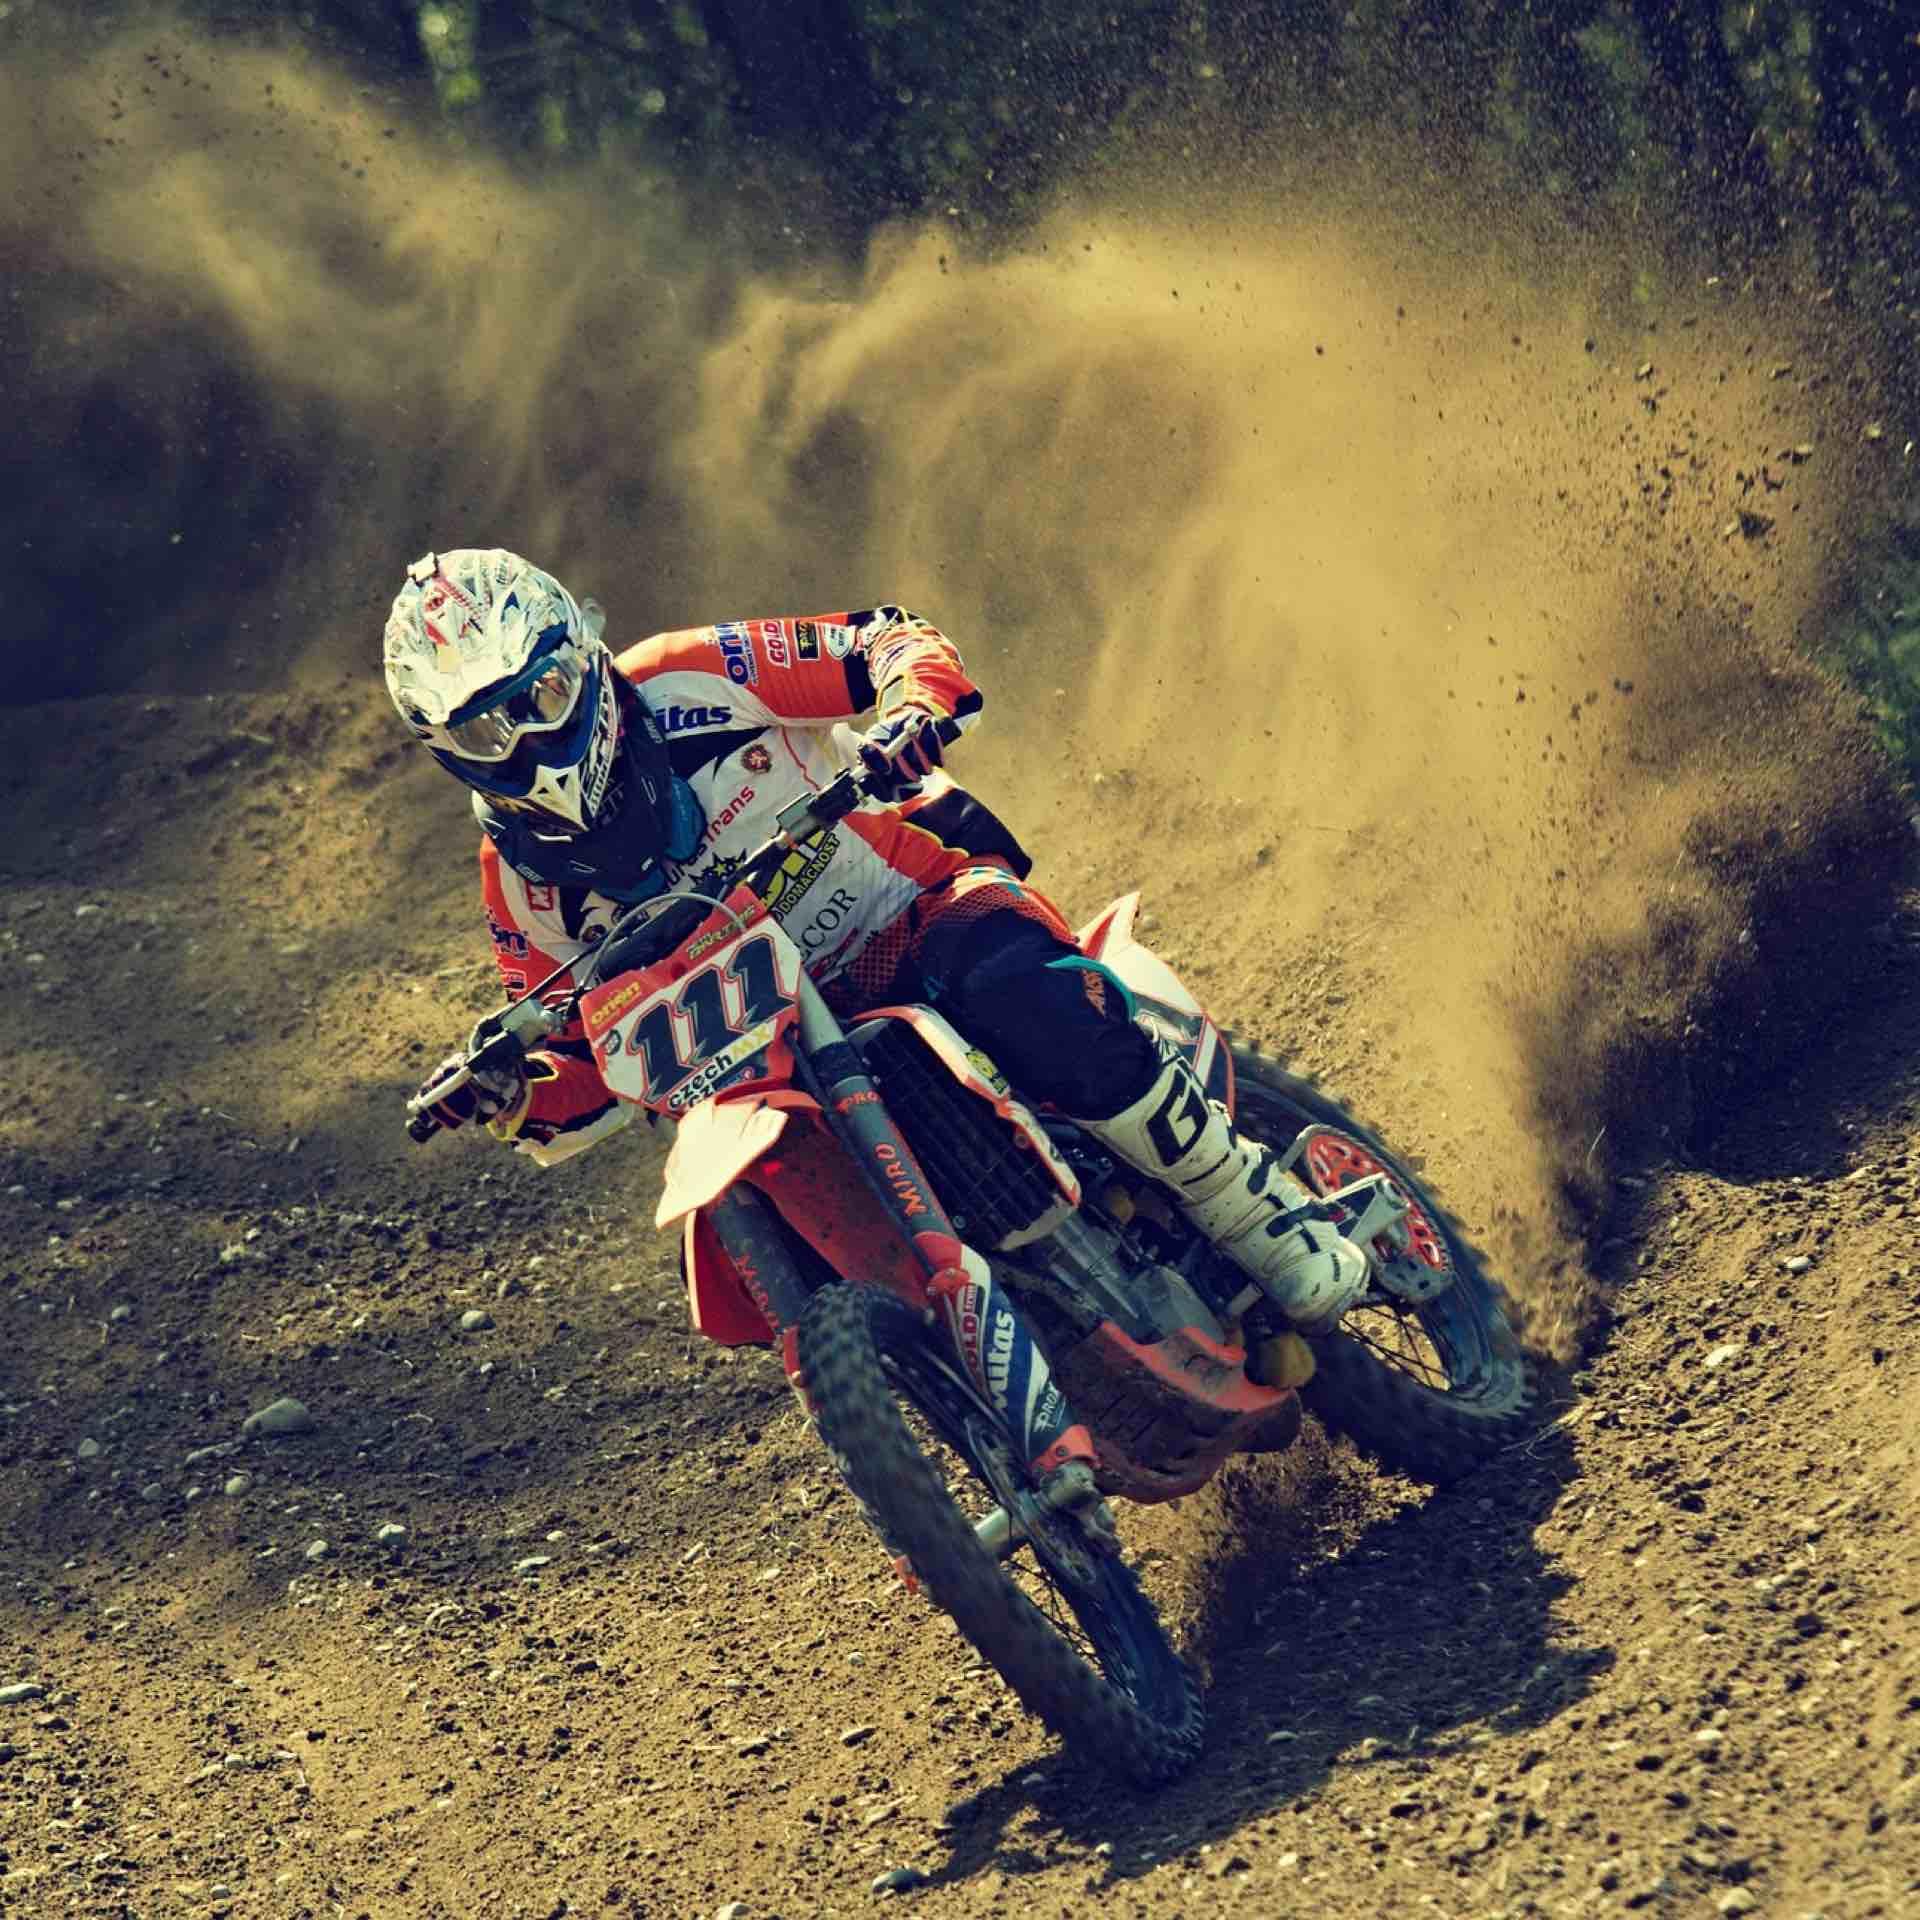 racing motorbike